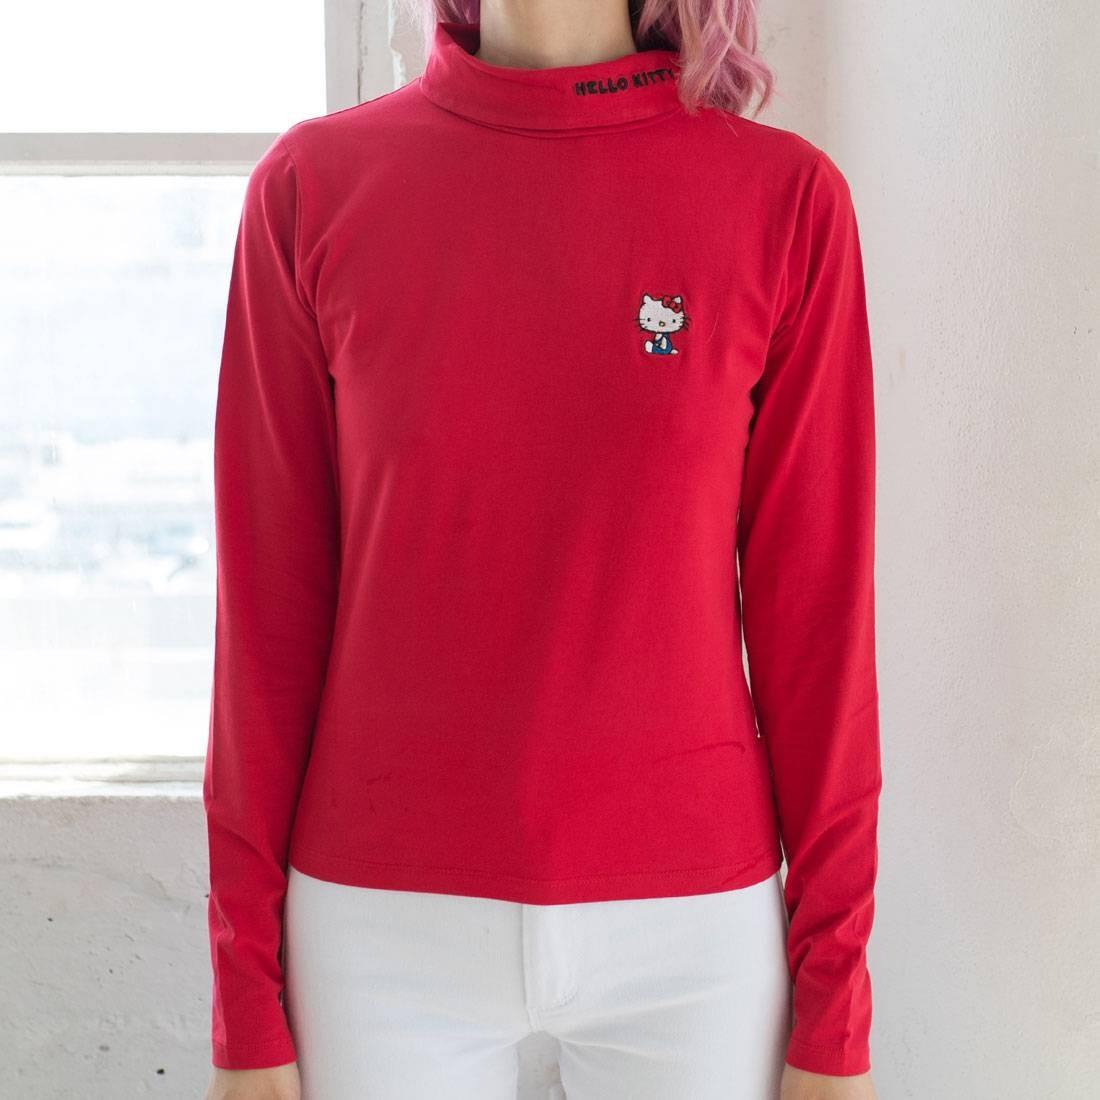 7c2b36e27 lazy oaf x hello kitty women skivvy turtleneck shirt red